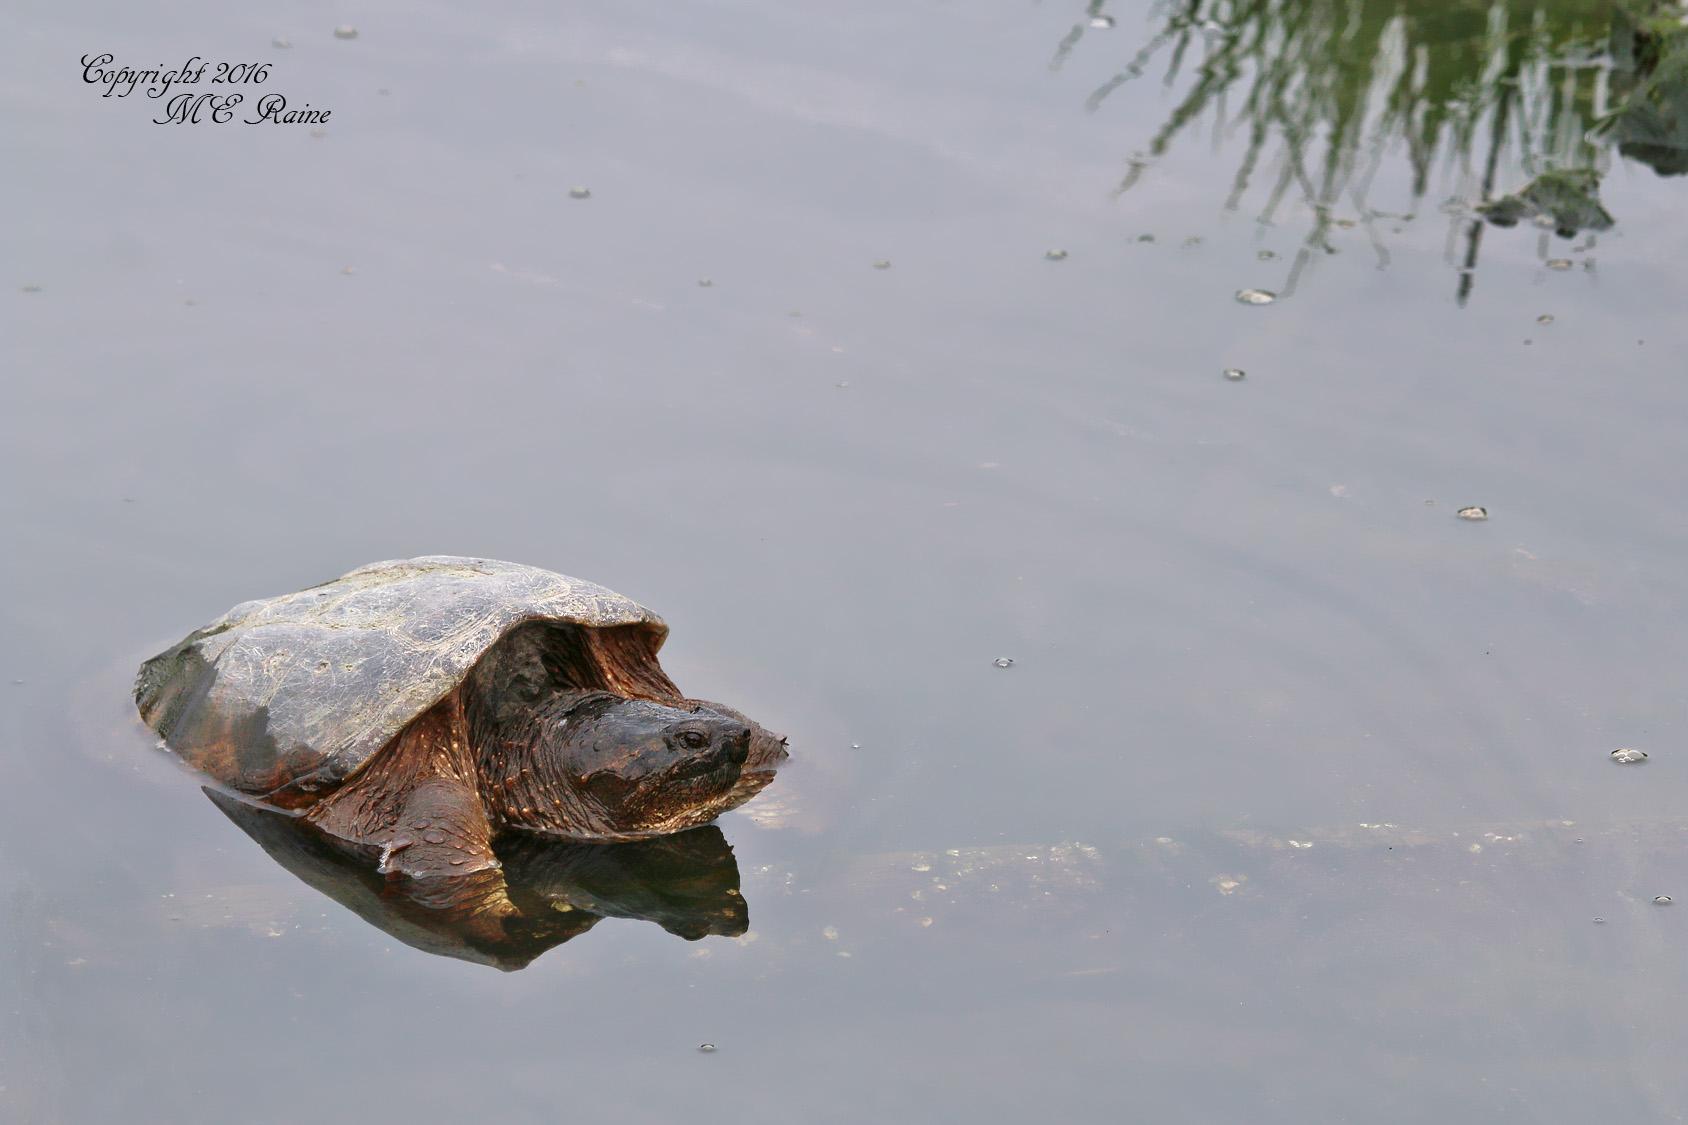 Turtle MCM 4.27.16 mickey